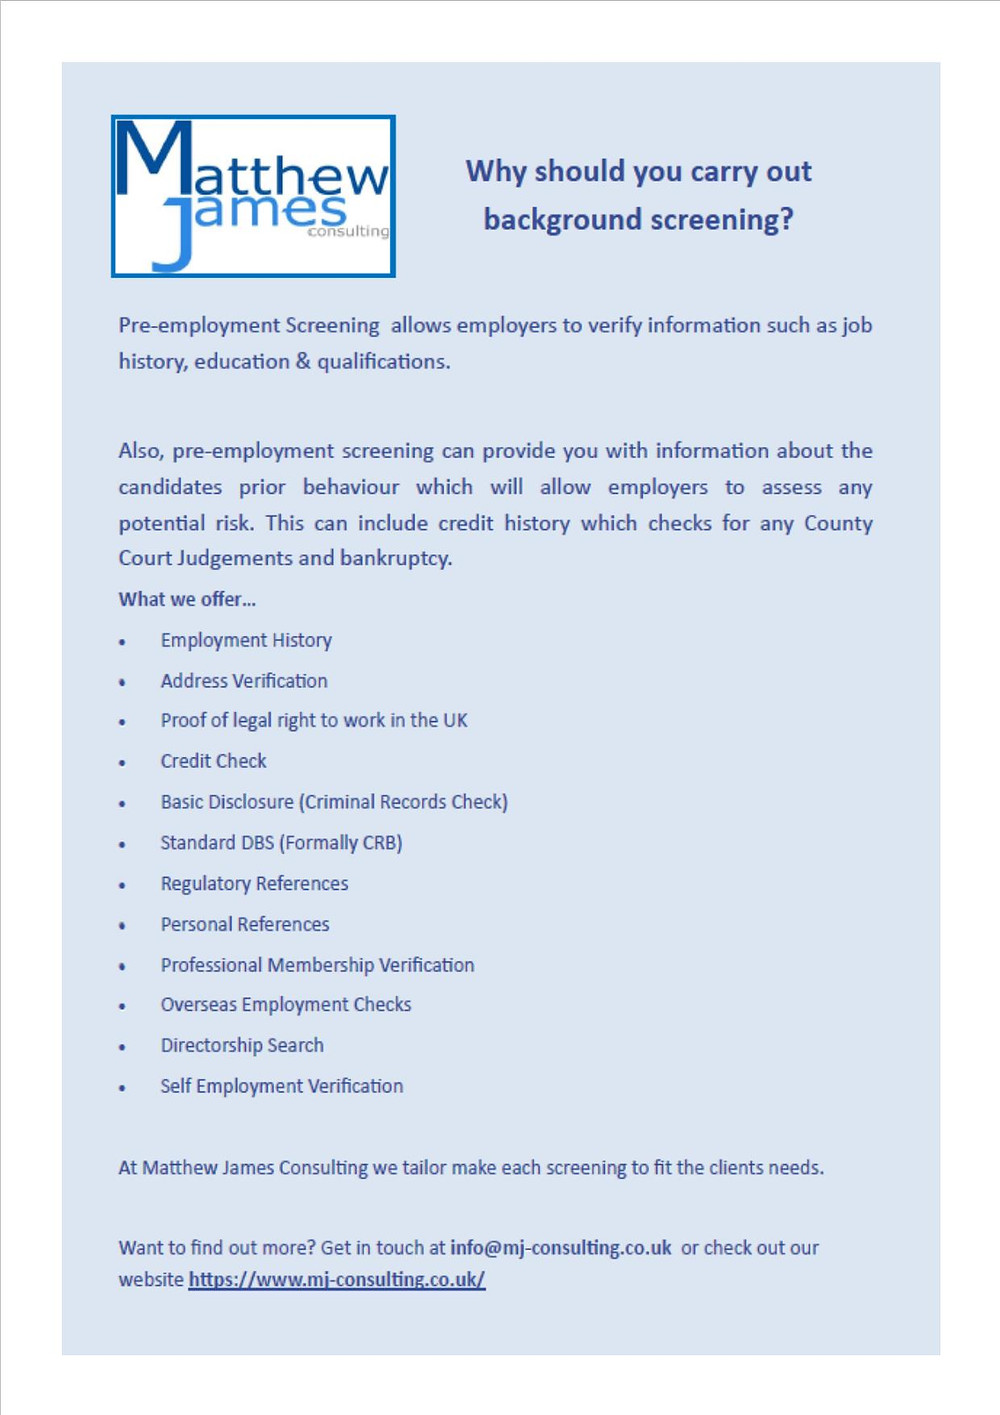 Background Screening Pre-employment Checks